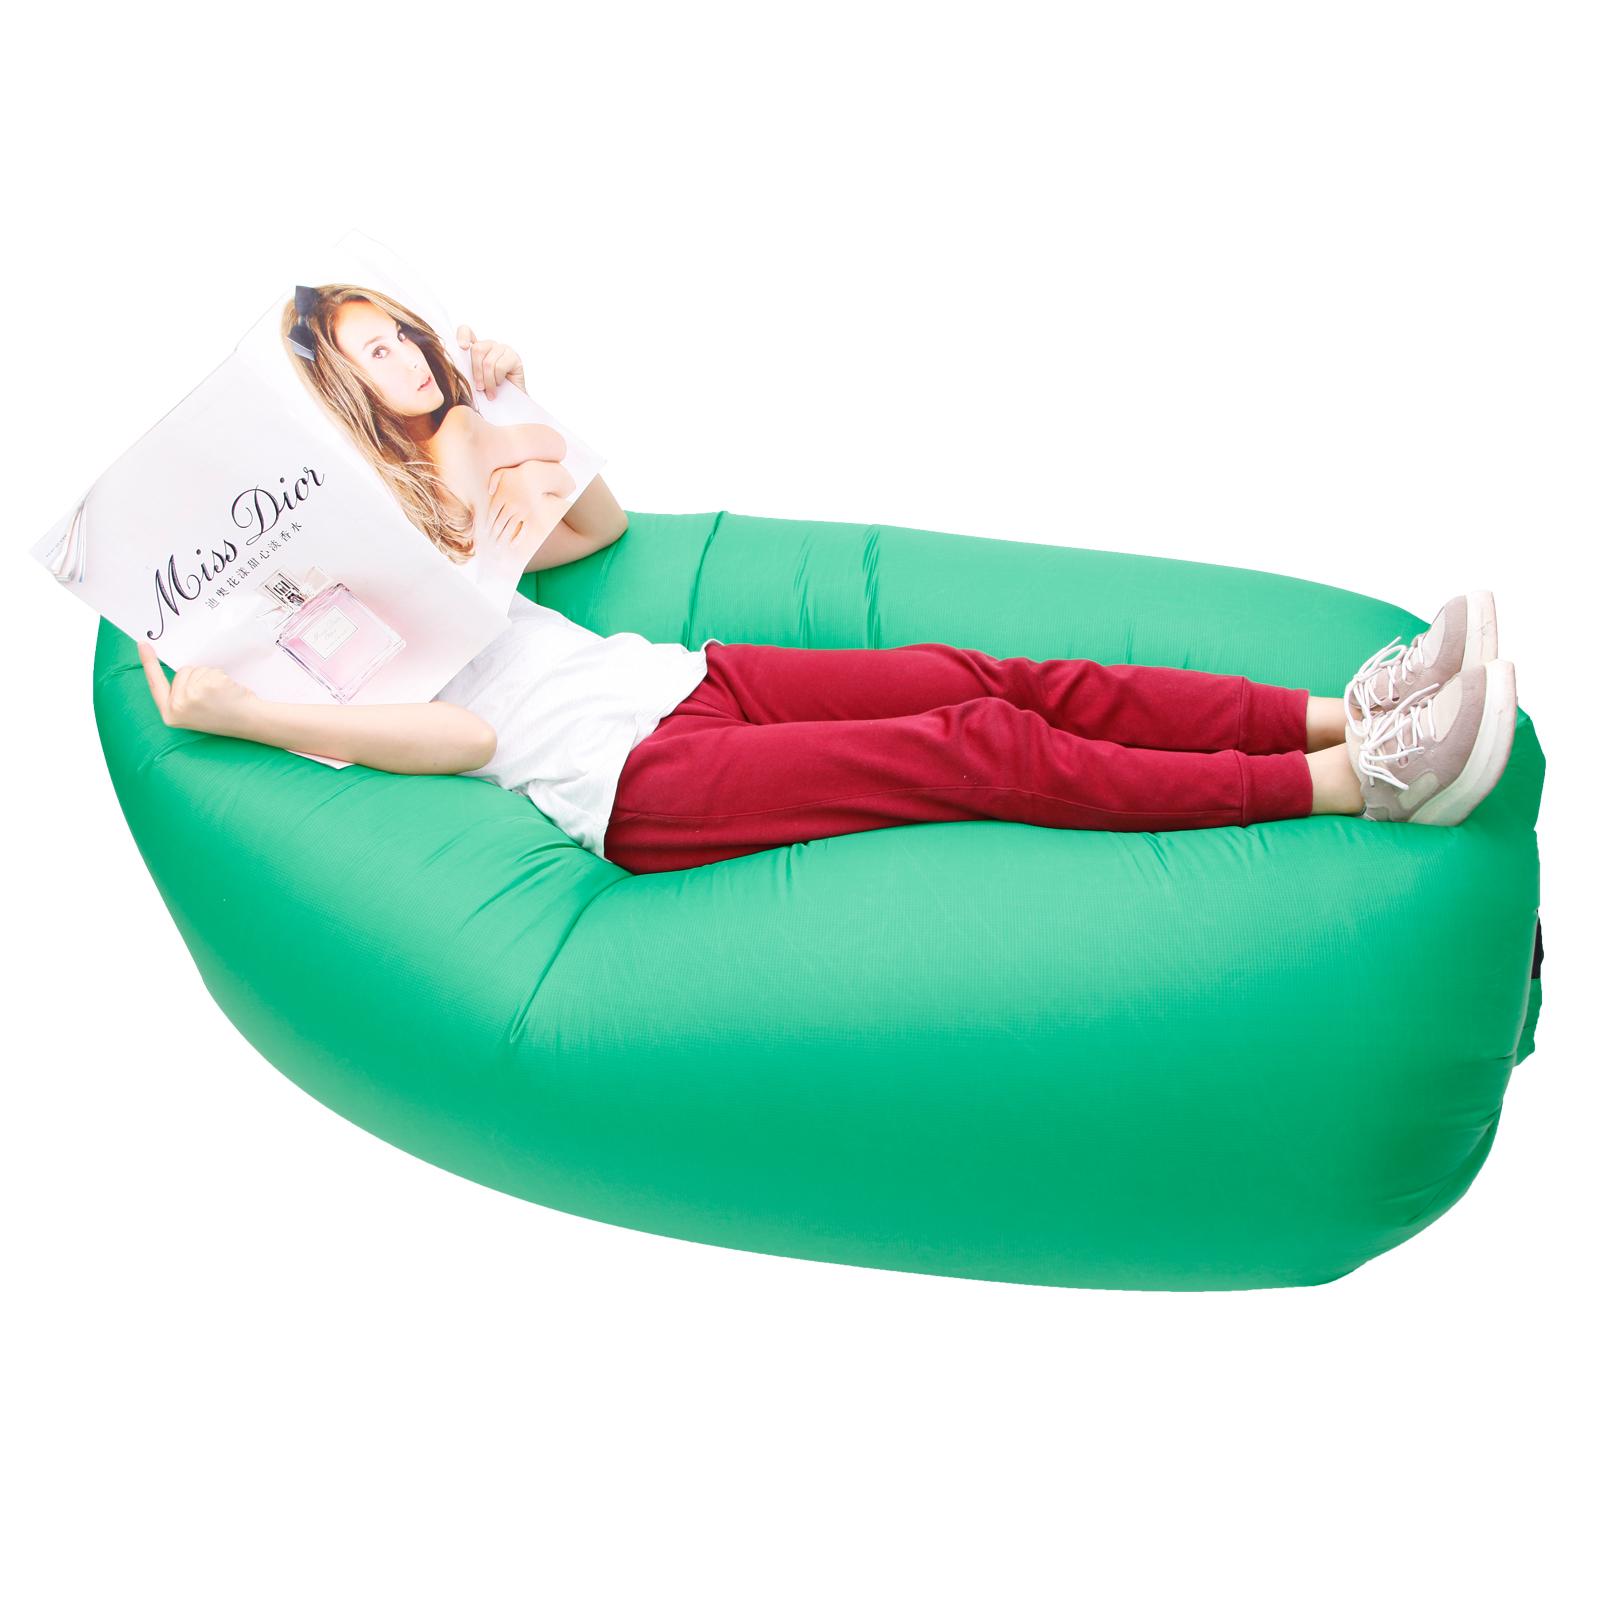 Sof cama hinchable tumbona inflable a aire para playa for Sofa cama inflable